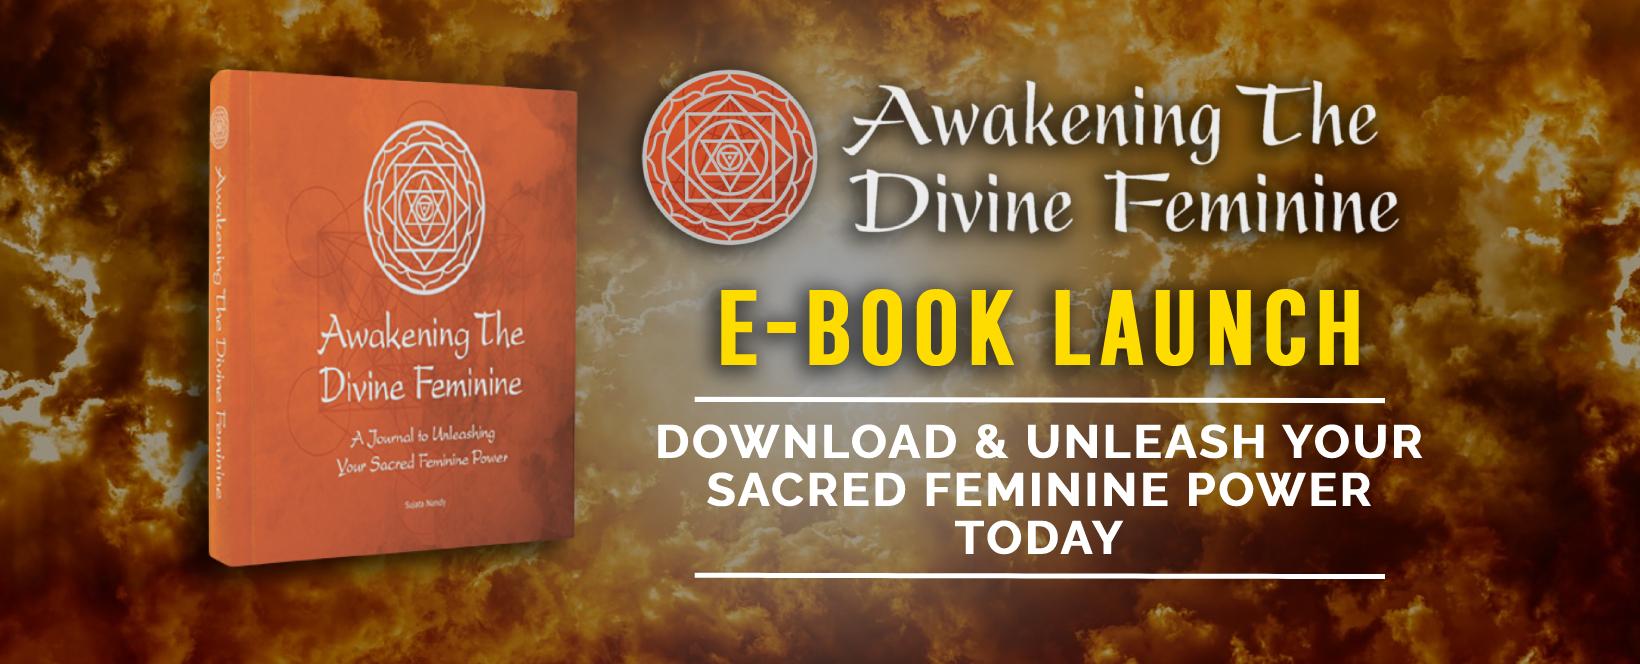 Awakening The Divine Feminine EBook by Sujata Nandy